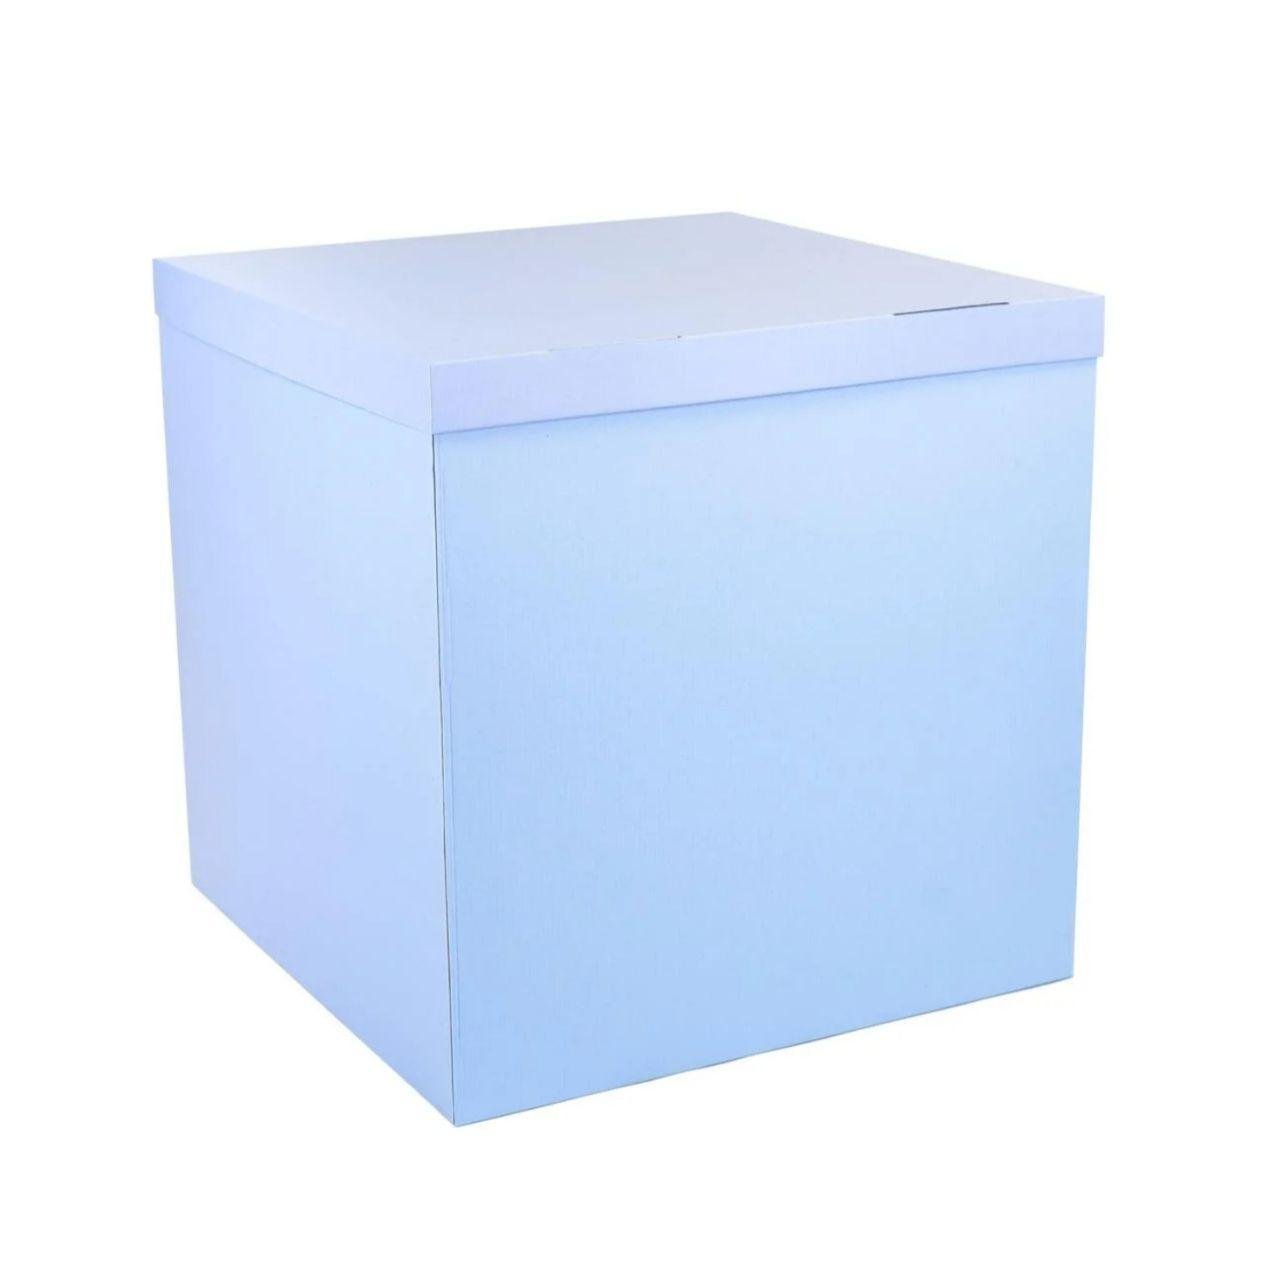 Коробка сюрприз для шаров голубая, класс А 70х70х70см